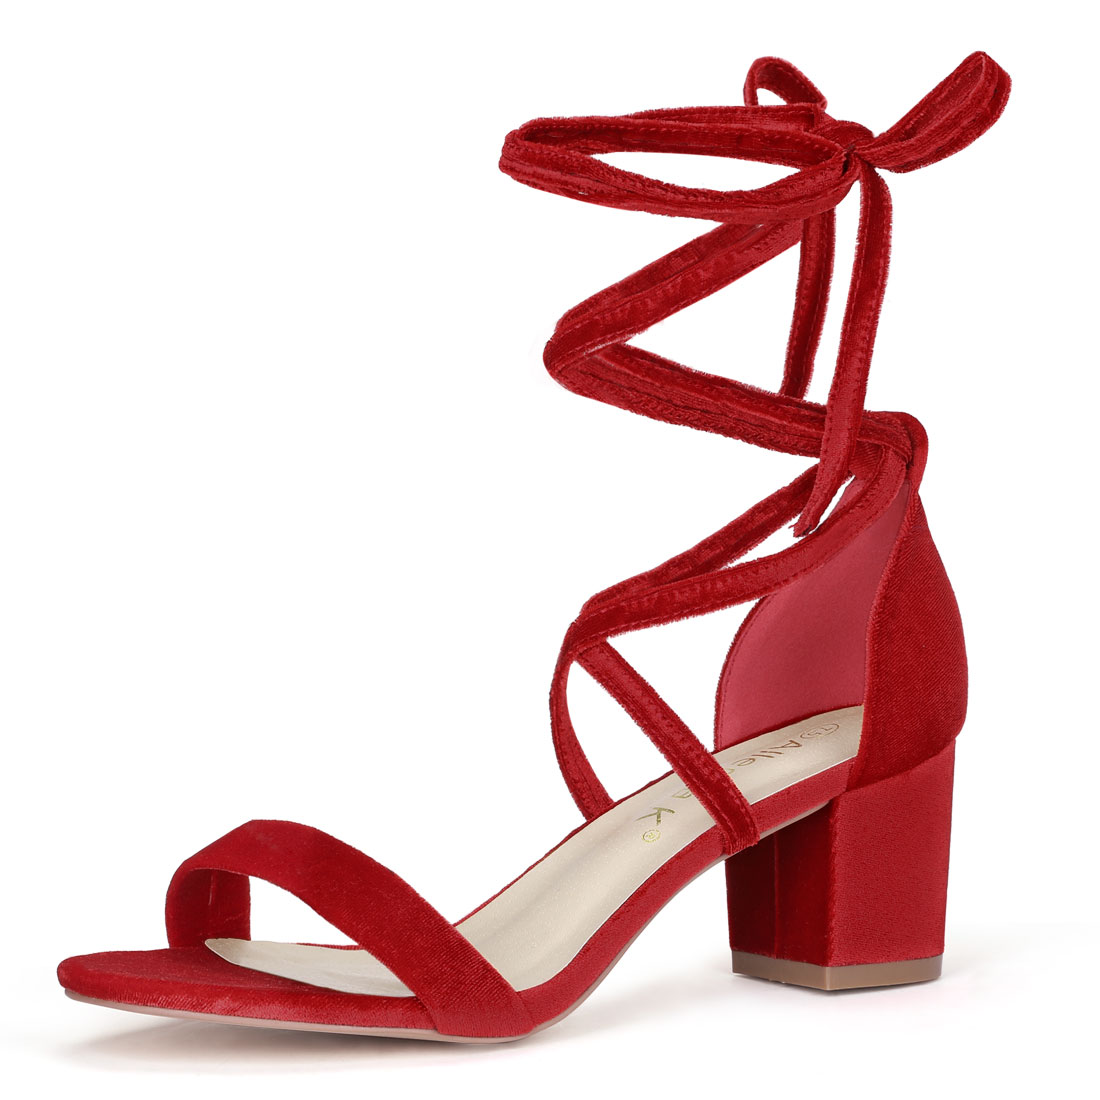 Allegra K Women Open Toe Lace Up Mid Chunky Heeled Sandals Red-velvet 7 M US